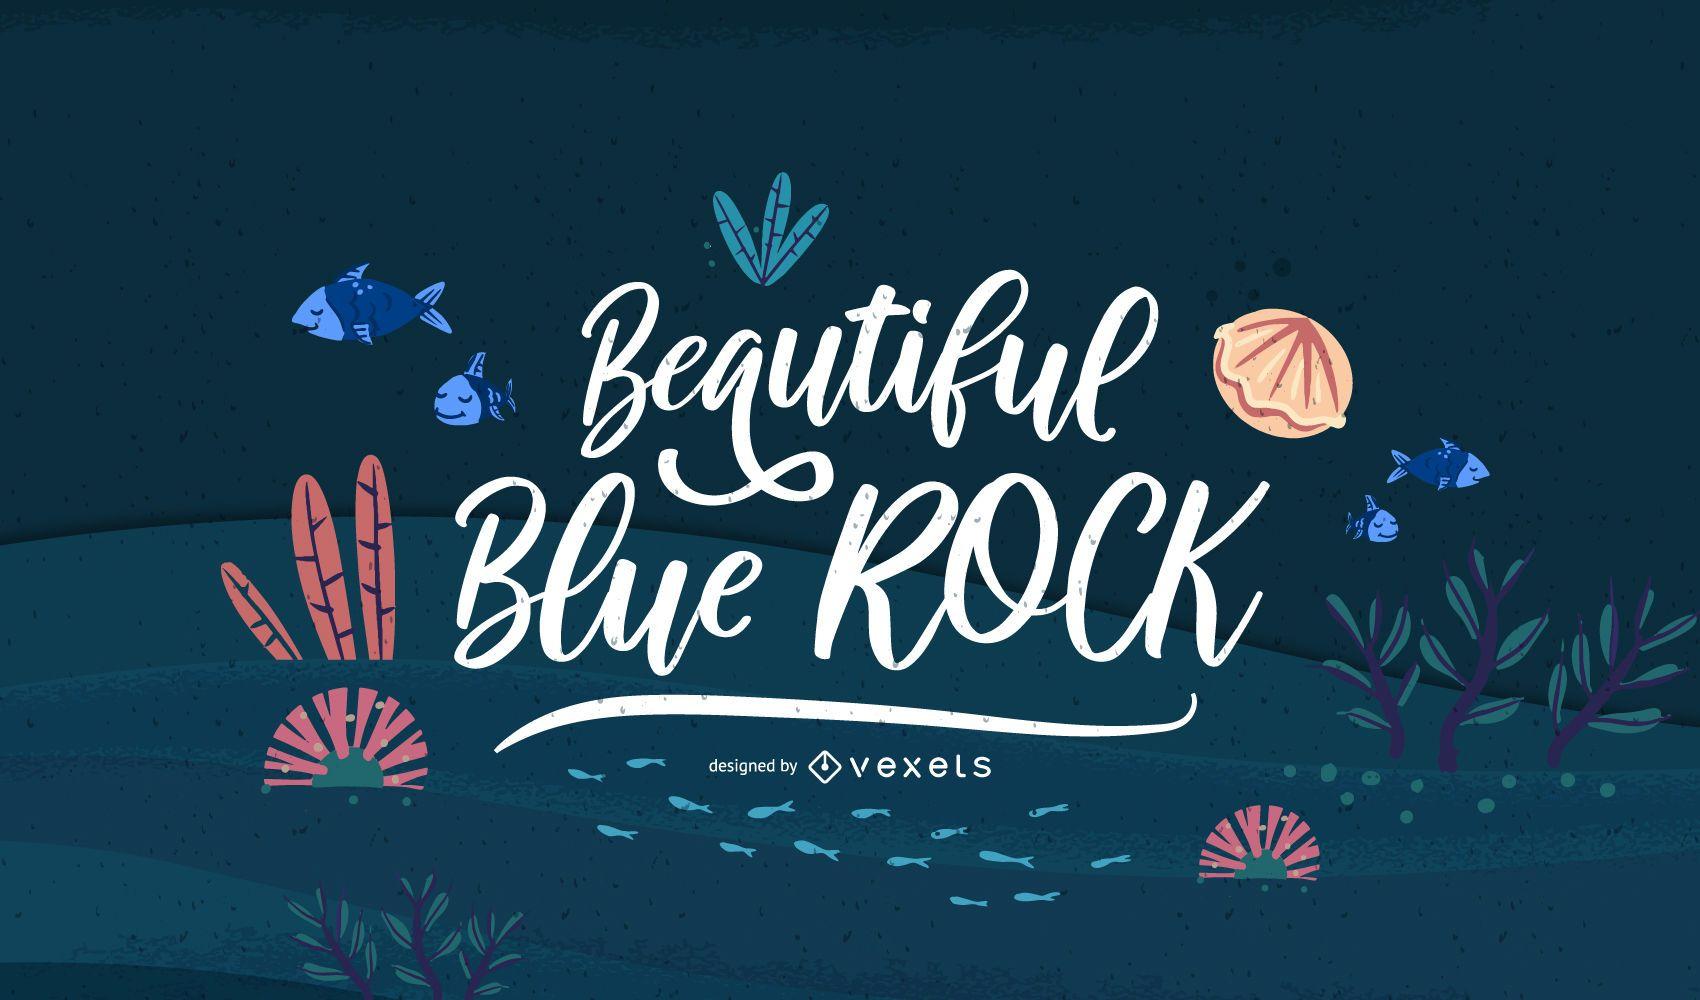 Diseño de banner de cita de letras oceánicas